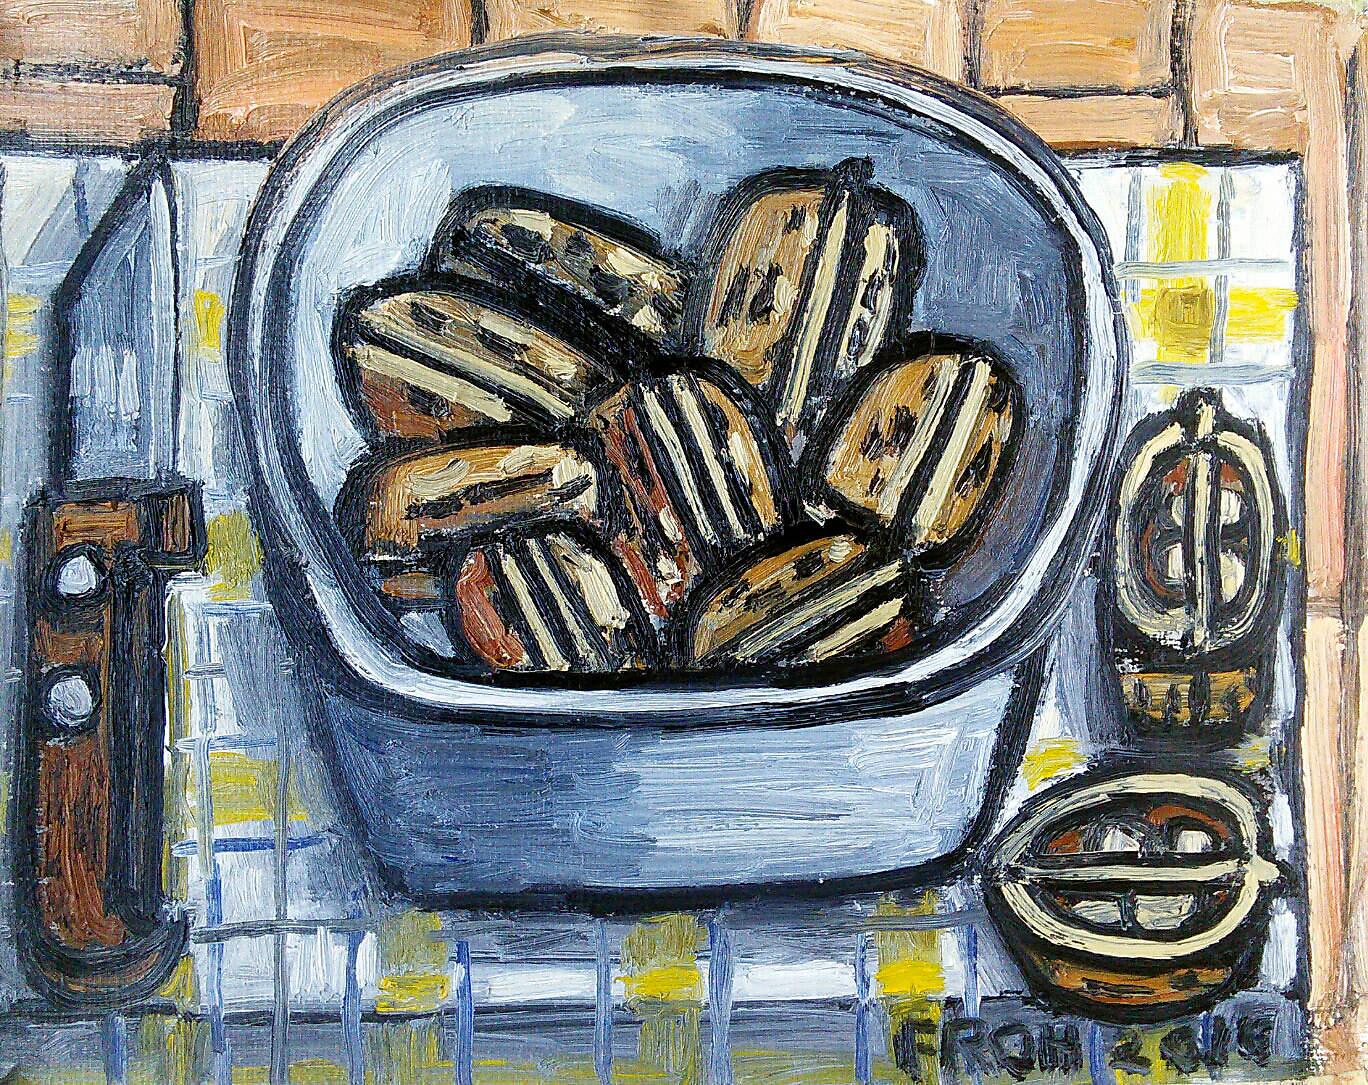 Nueces (Walnuts), 2016, oil on linen mounted on board, 26x20cm